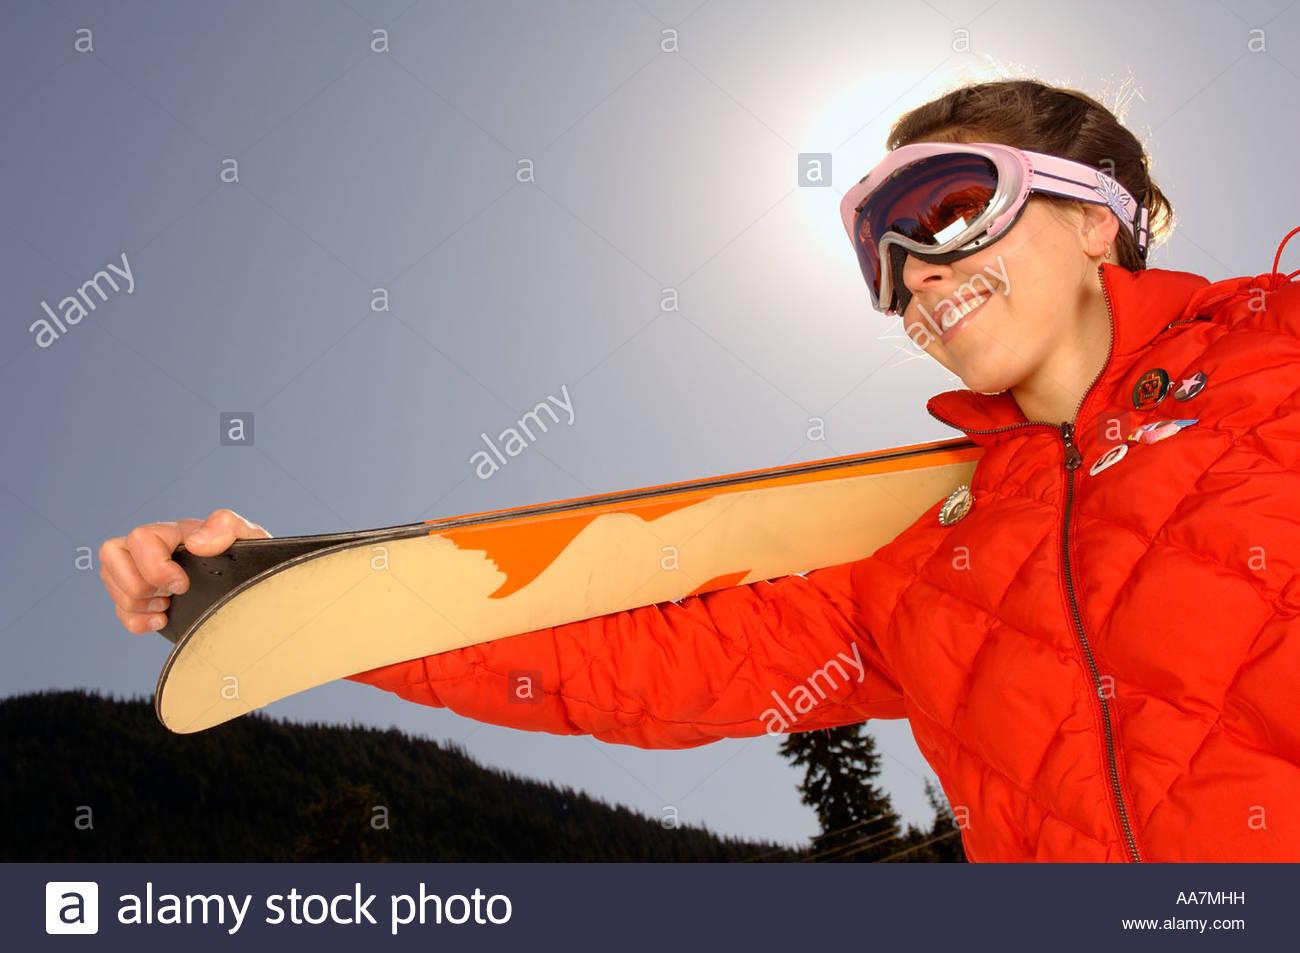 Female skier carrying skis - Stock Image